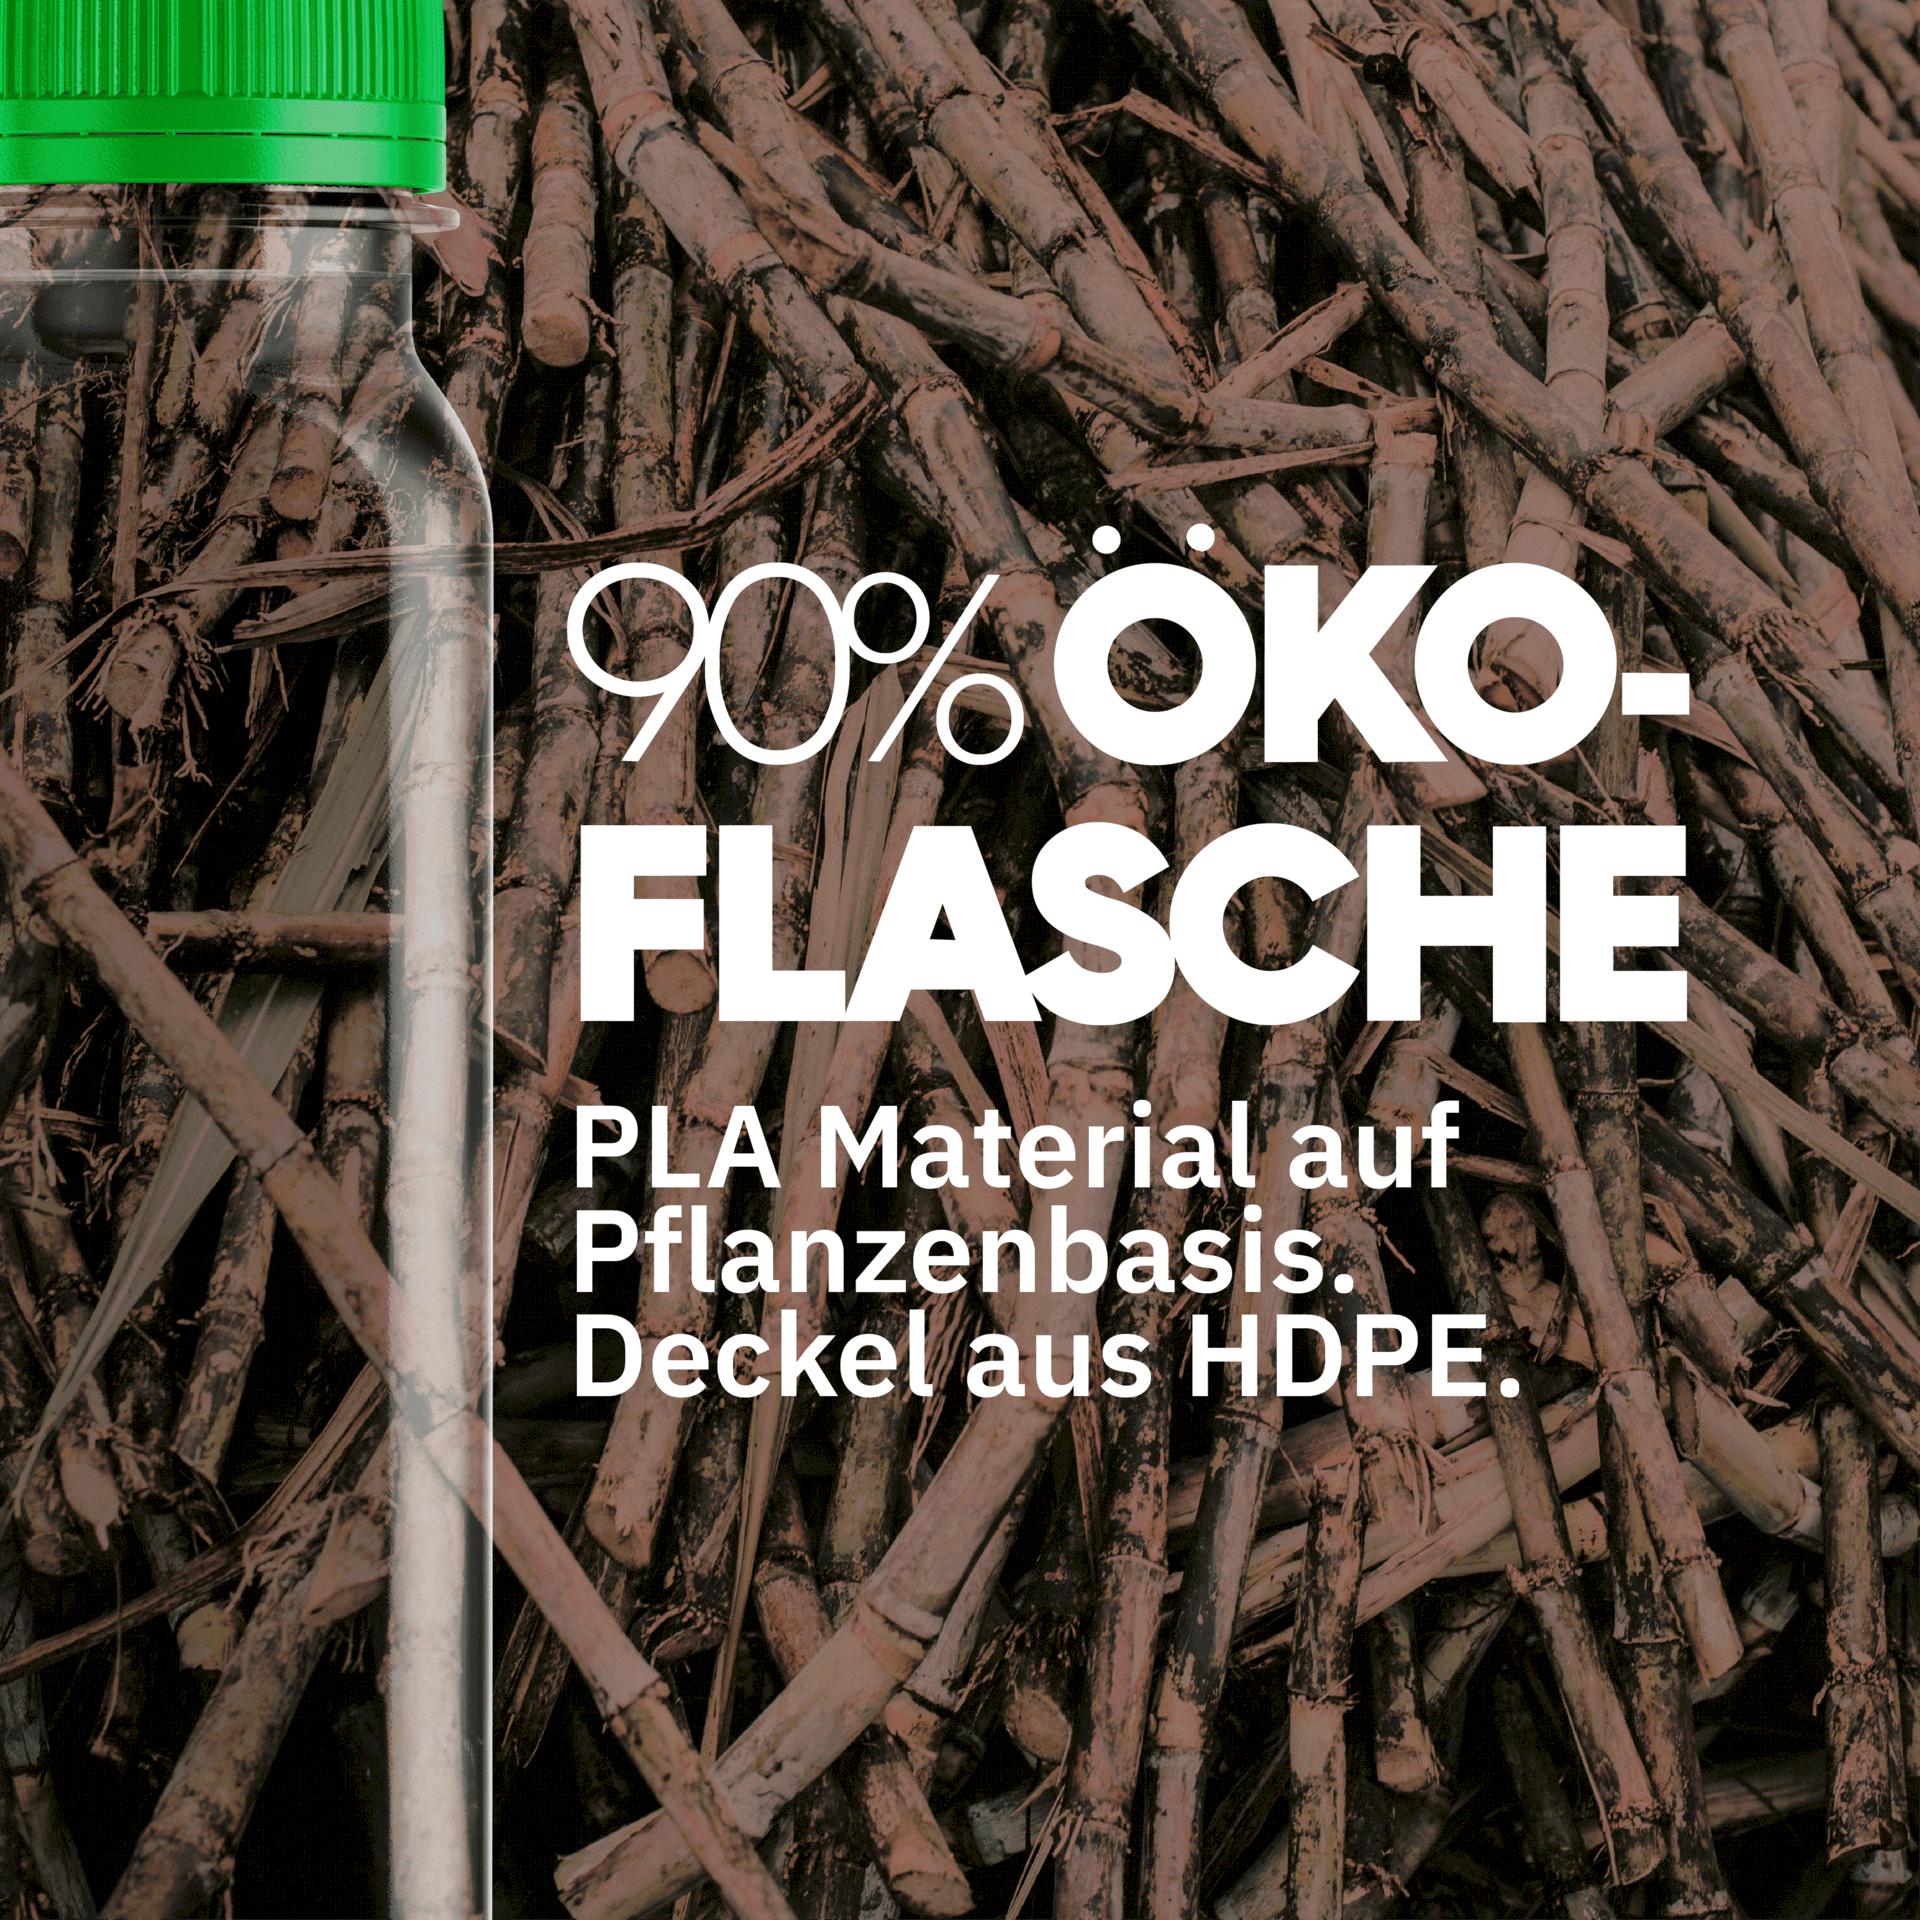 Öko-PLA-Flasche 90% Tile